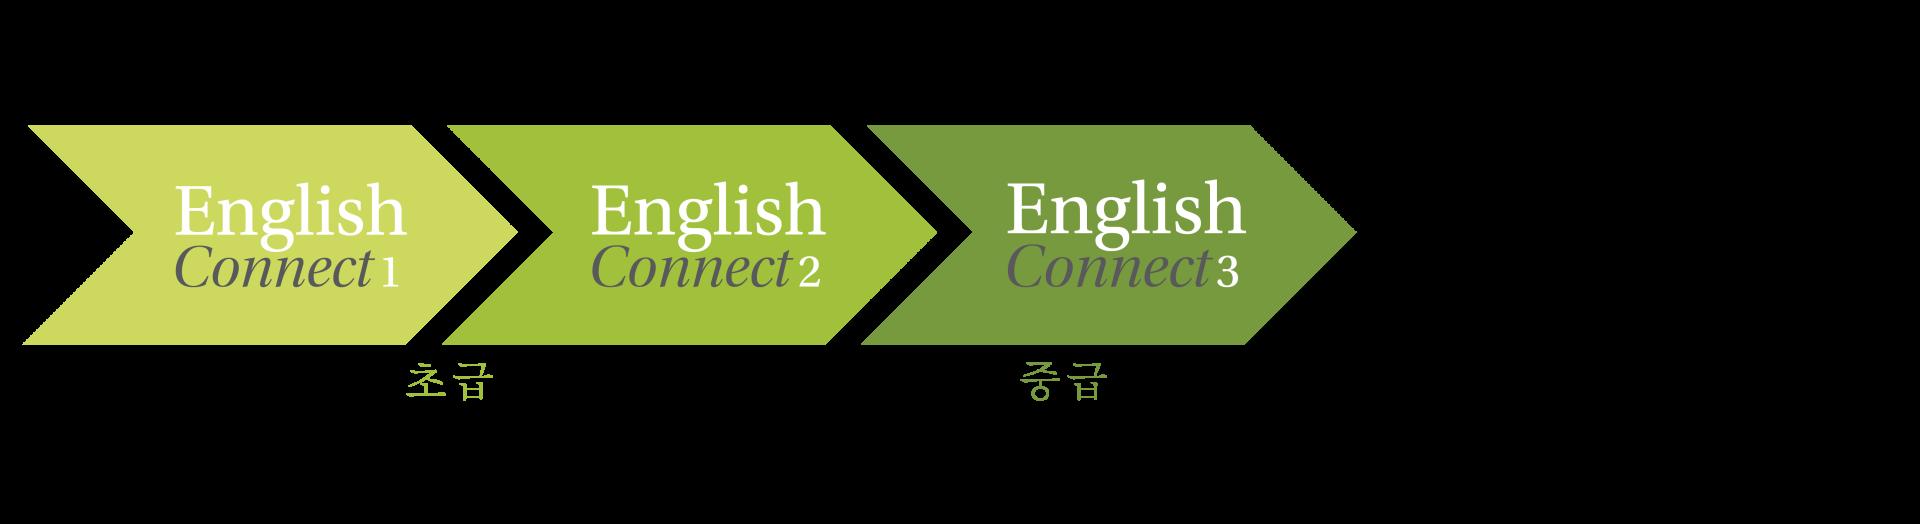 EnglishConnect V 모양 아이콘